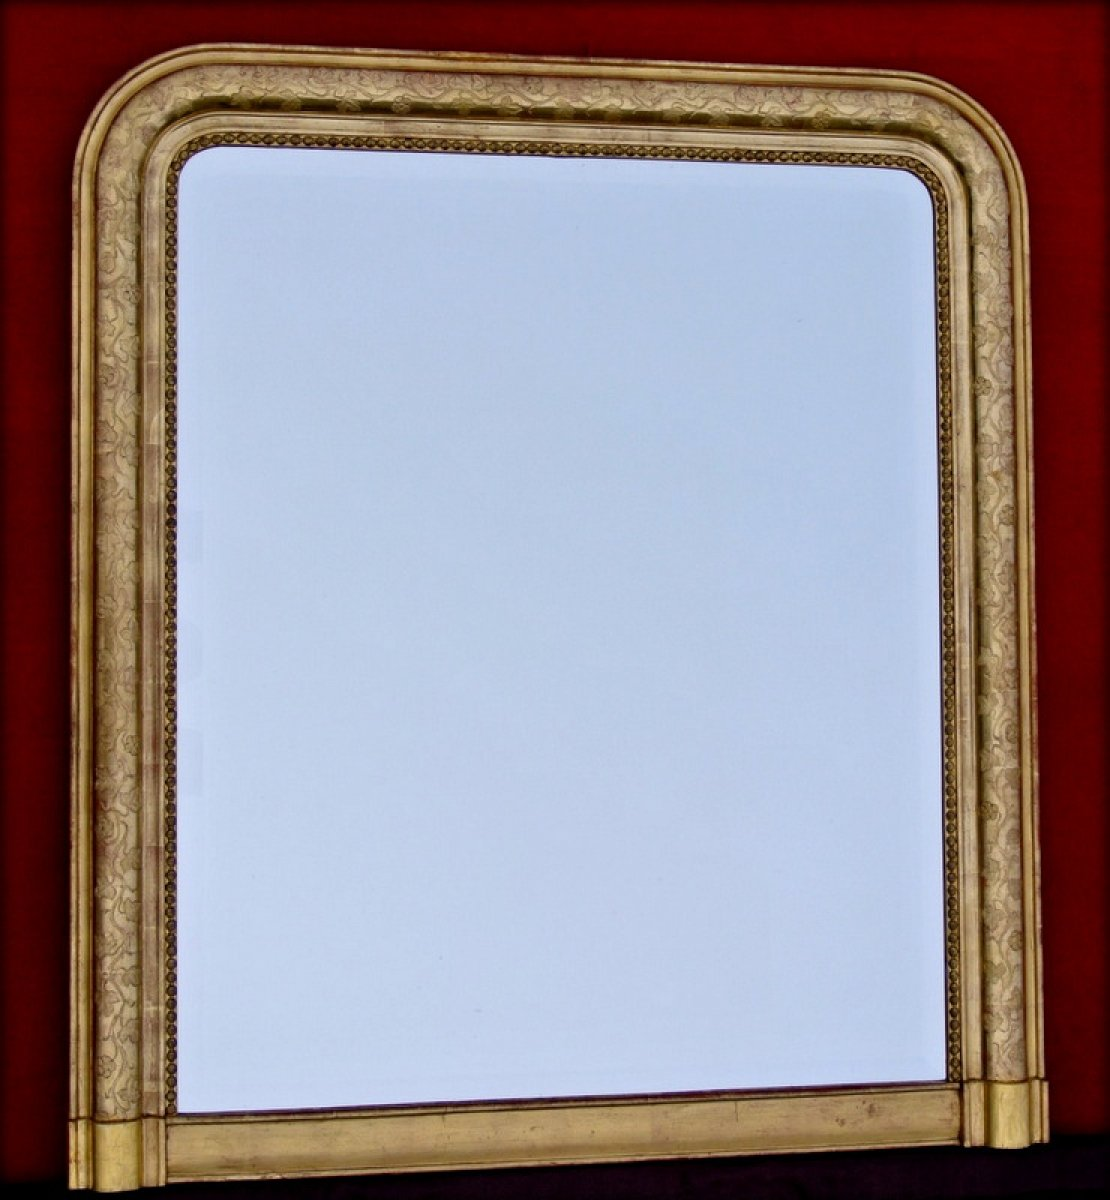 Miroir du xixe si cle for Miroir xix siecle